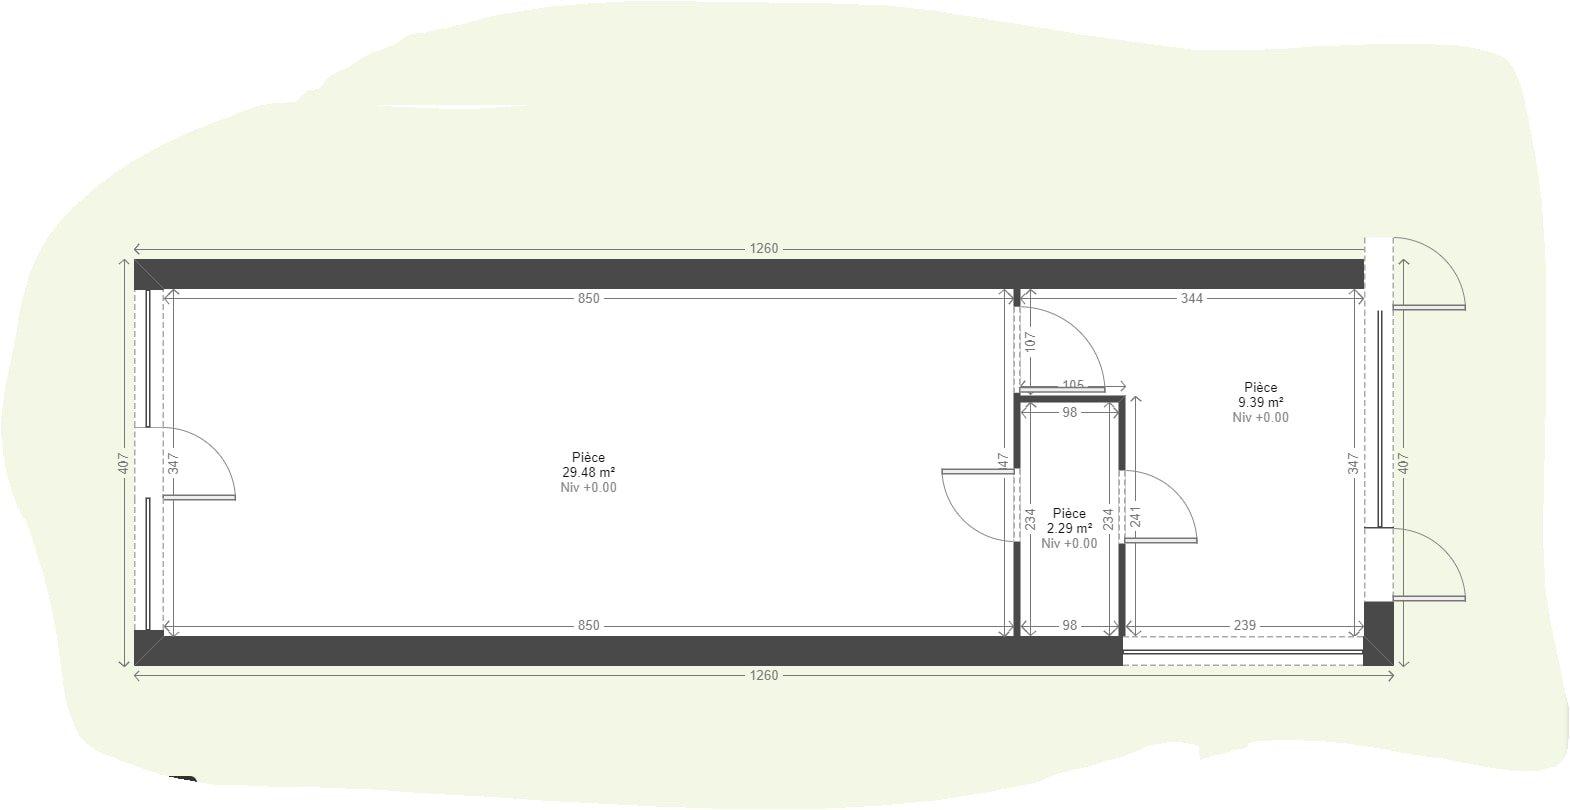 agence immobili re toulon vente et location agence avenir. Black Bedroom Furniture Sets. Home Design Ideas